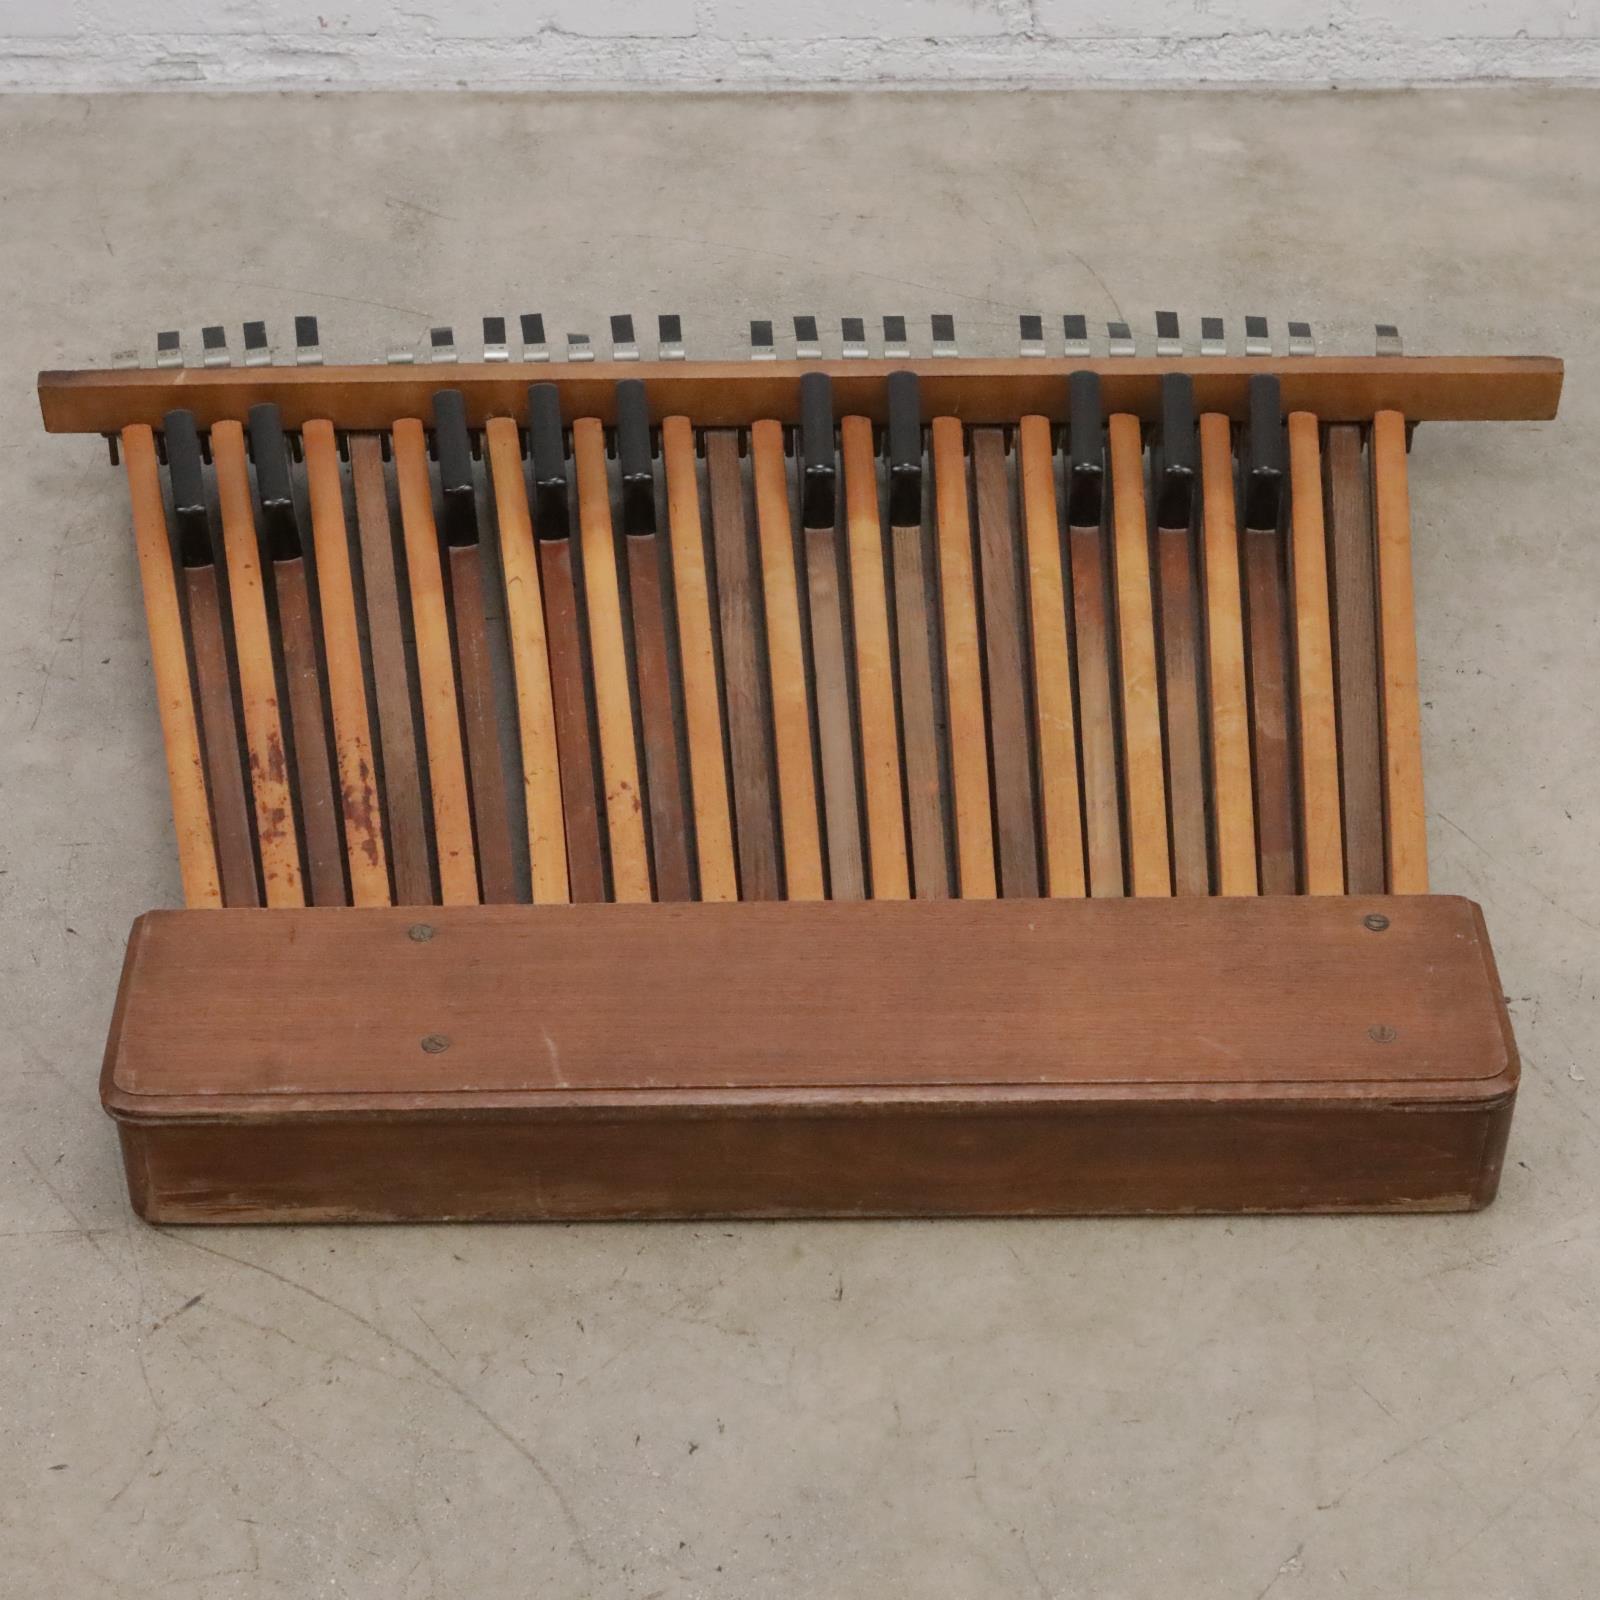 Vintage Hammond B3 25-Key Organ Bass Pedals #44112